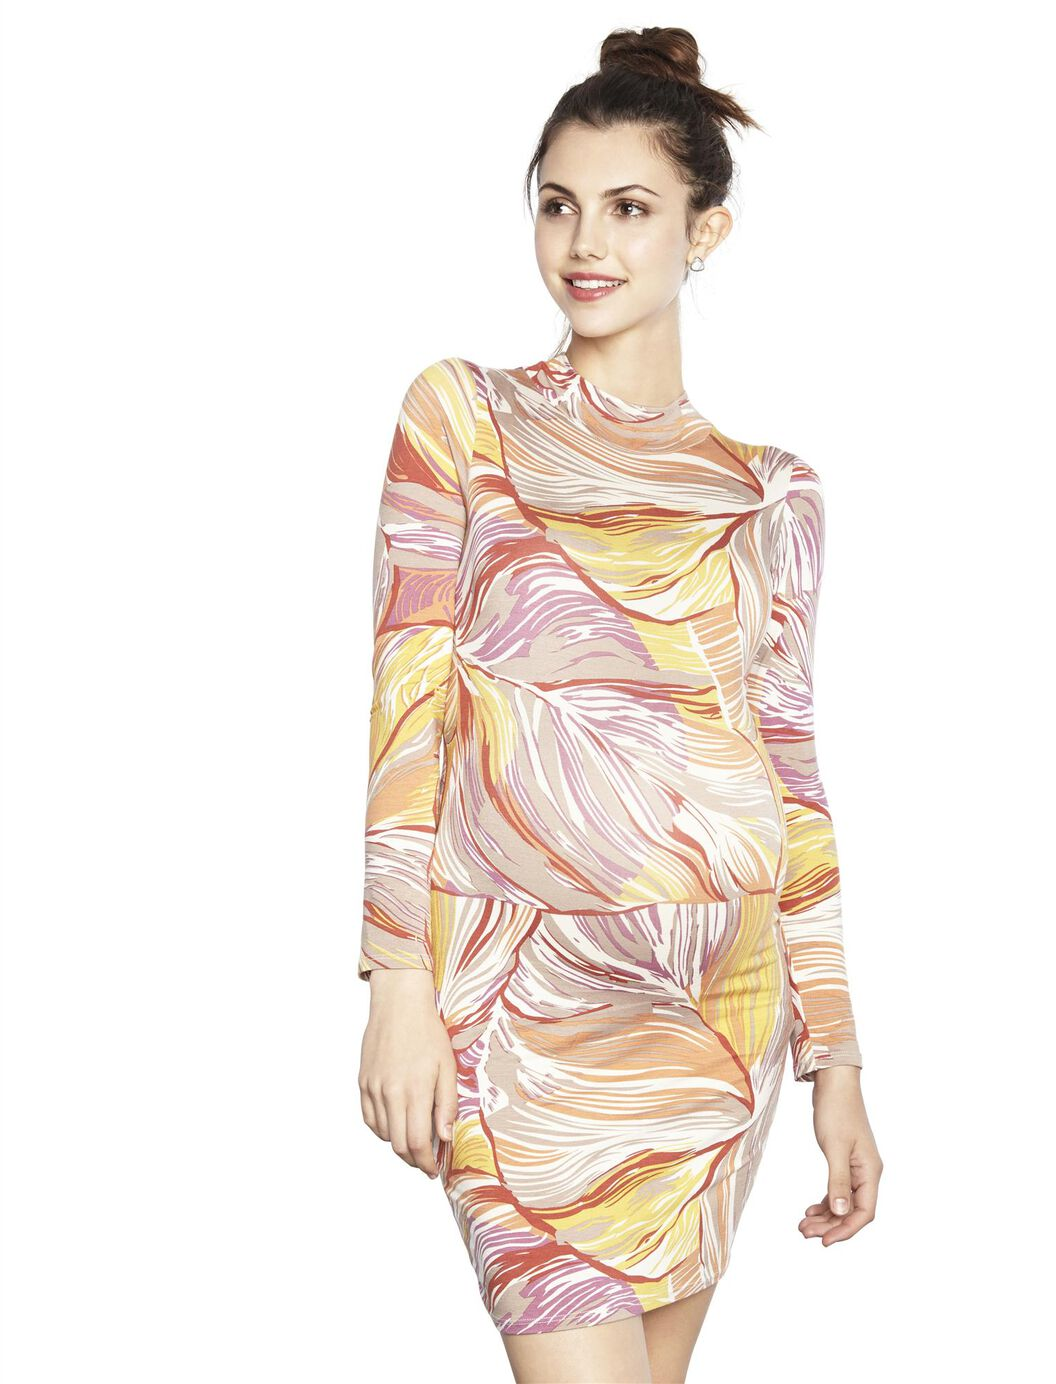 Rachel pally maternity dress a pea in the pod maternity rachel pally maternity dress magnolia print ombrellifo Gallery